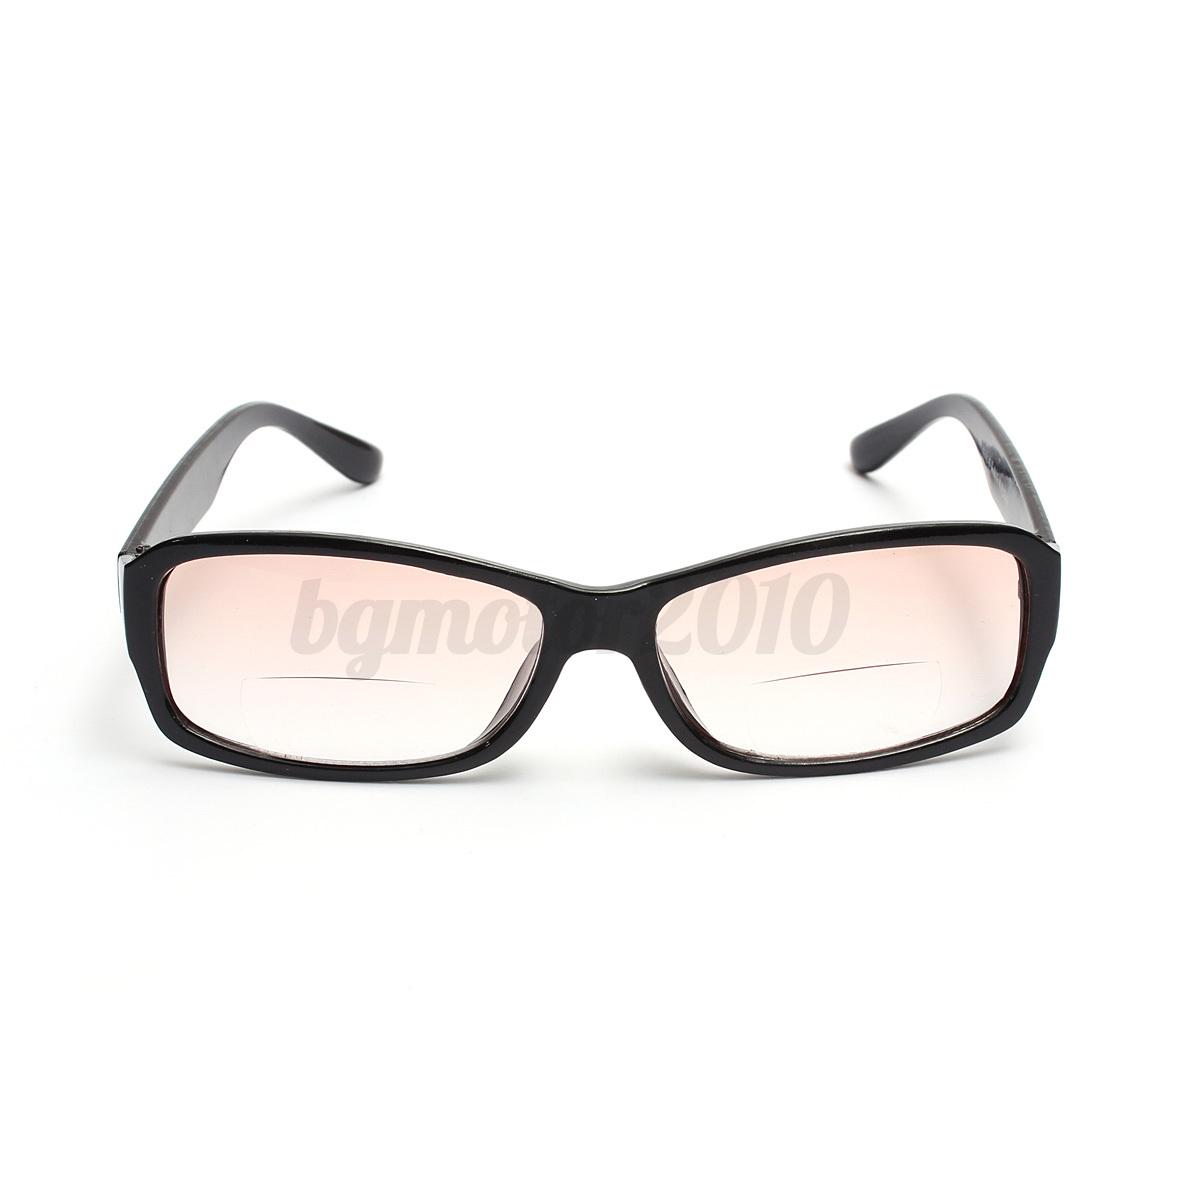 fashion sunglasses lightweight dual function bifocal